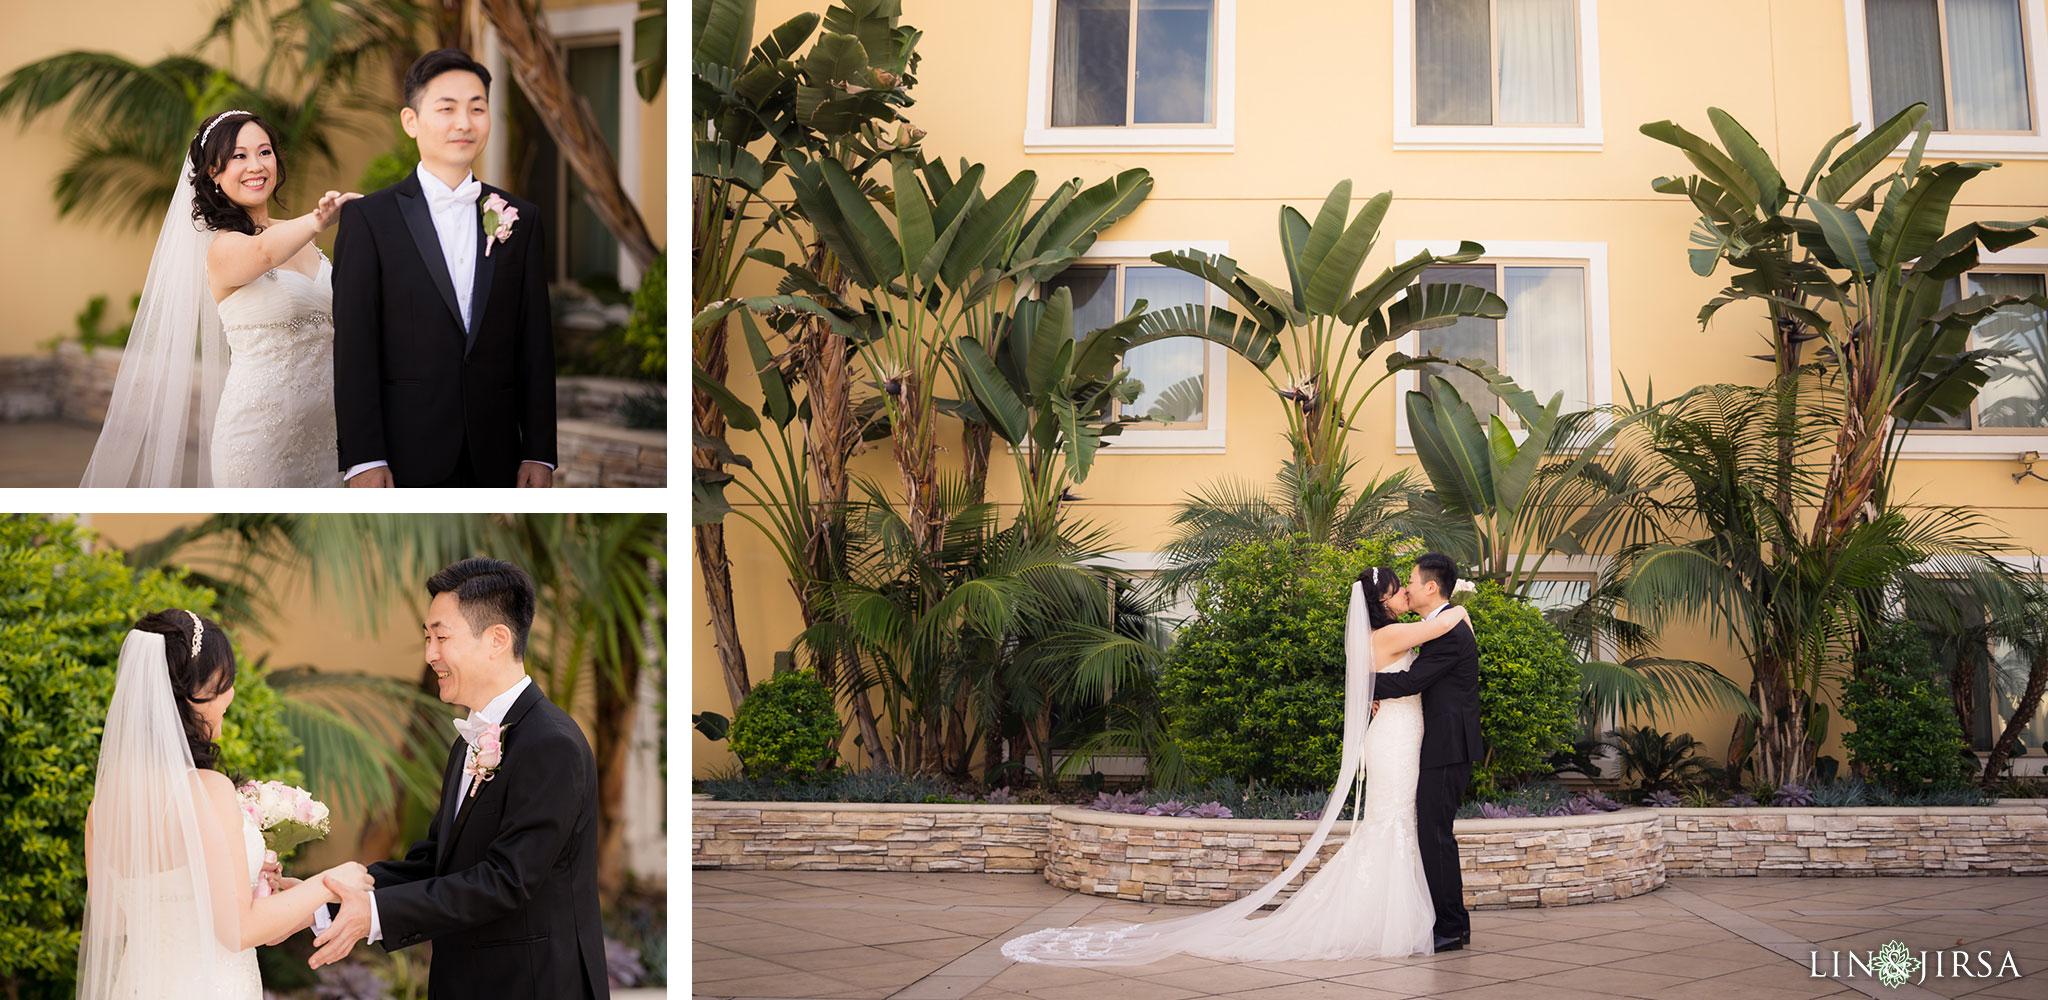 11 san gabriel hilton wedding first look photography